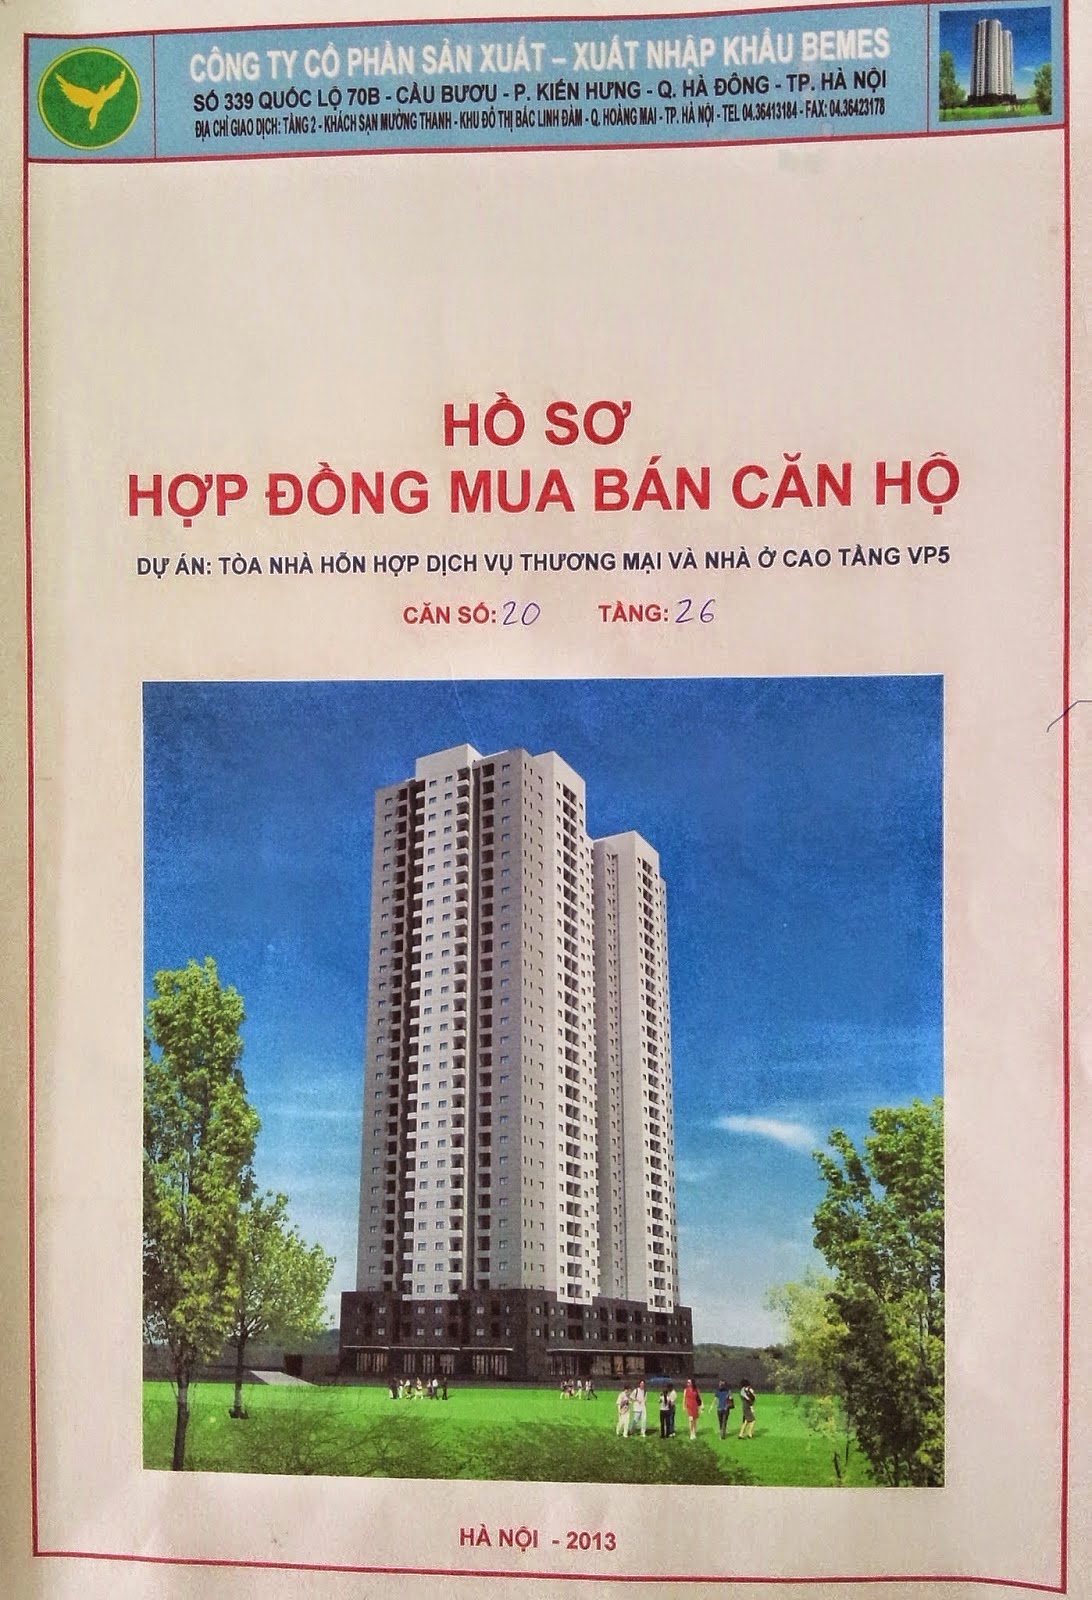 hop-dong-mua-ban-vp5-linh-dam